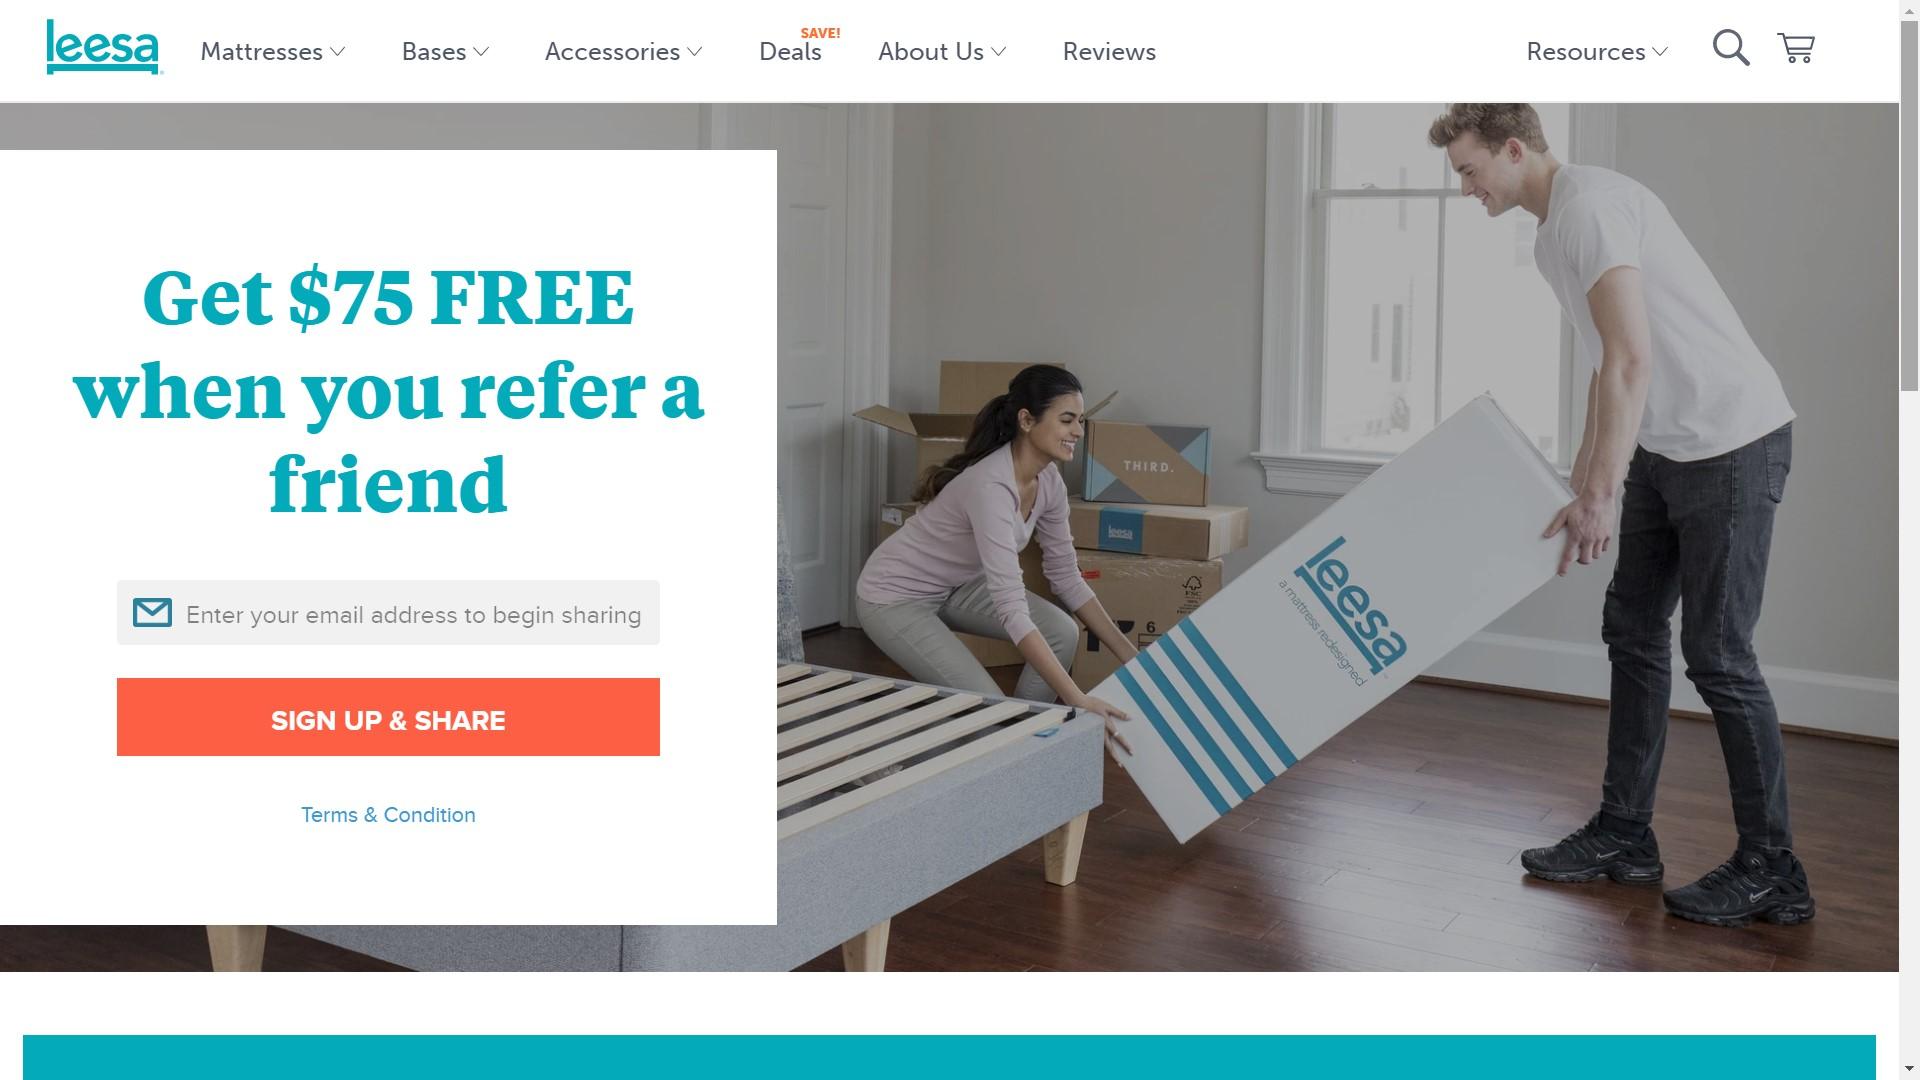 Leesa Shopify store referral program page